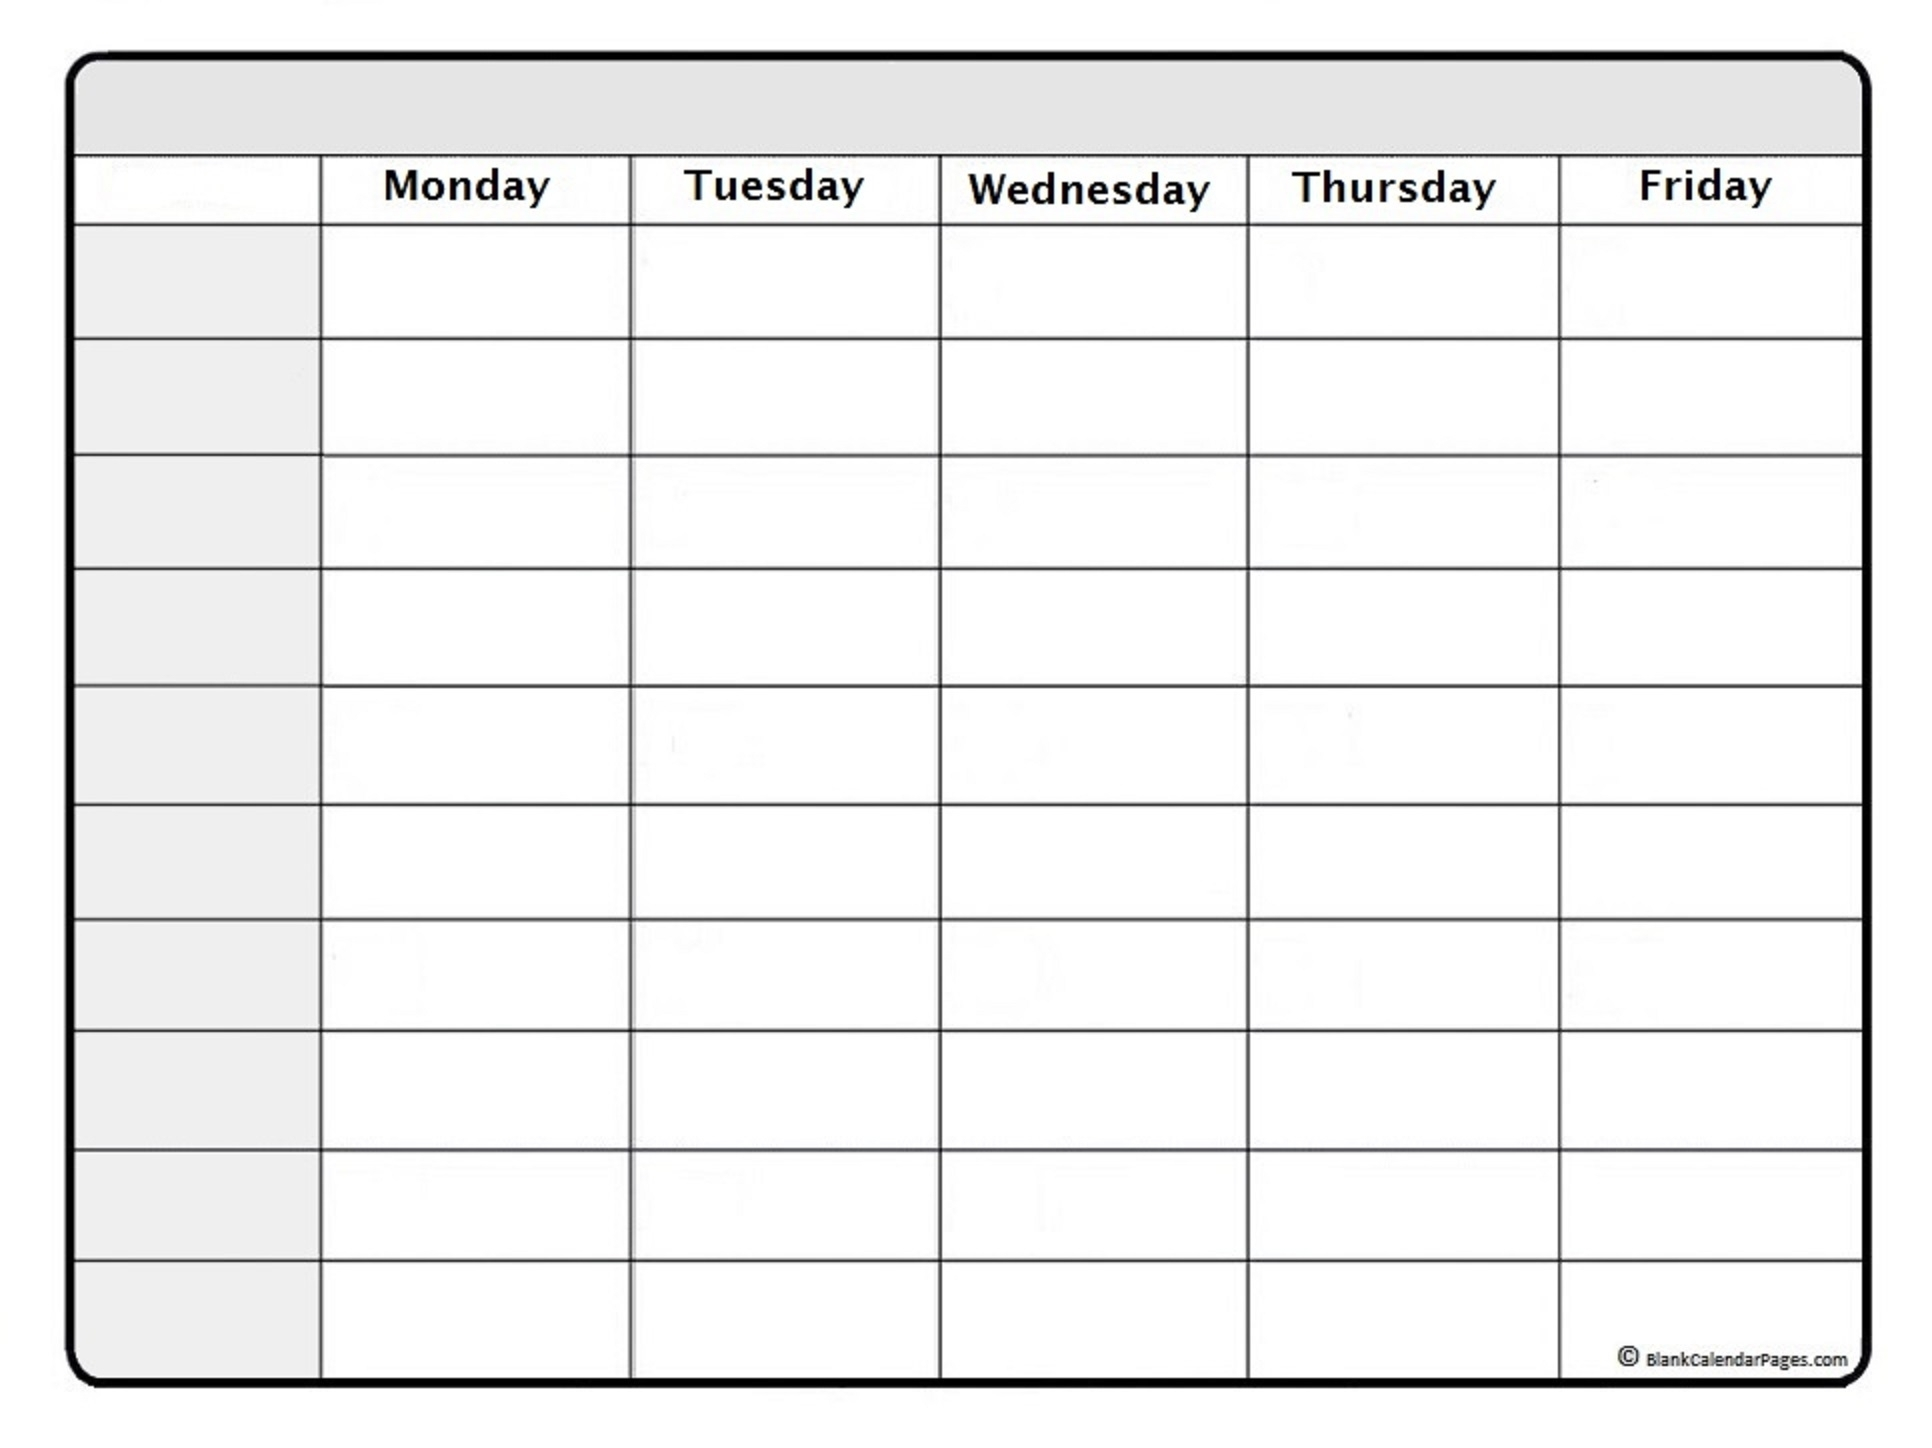 November 2020 Weekly Calendar   November 2020 Weekly Calendar Template